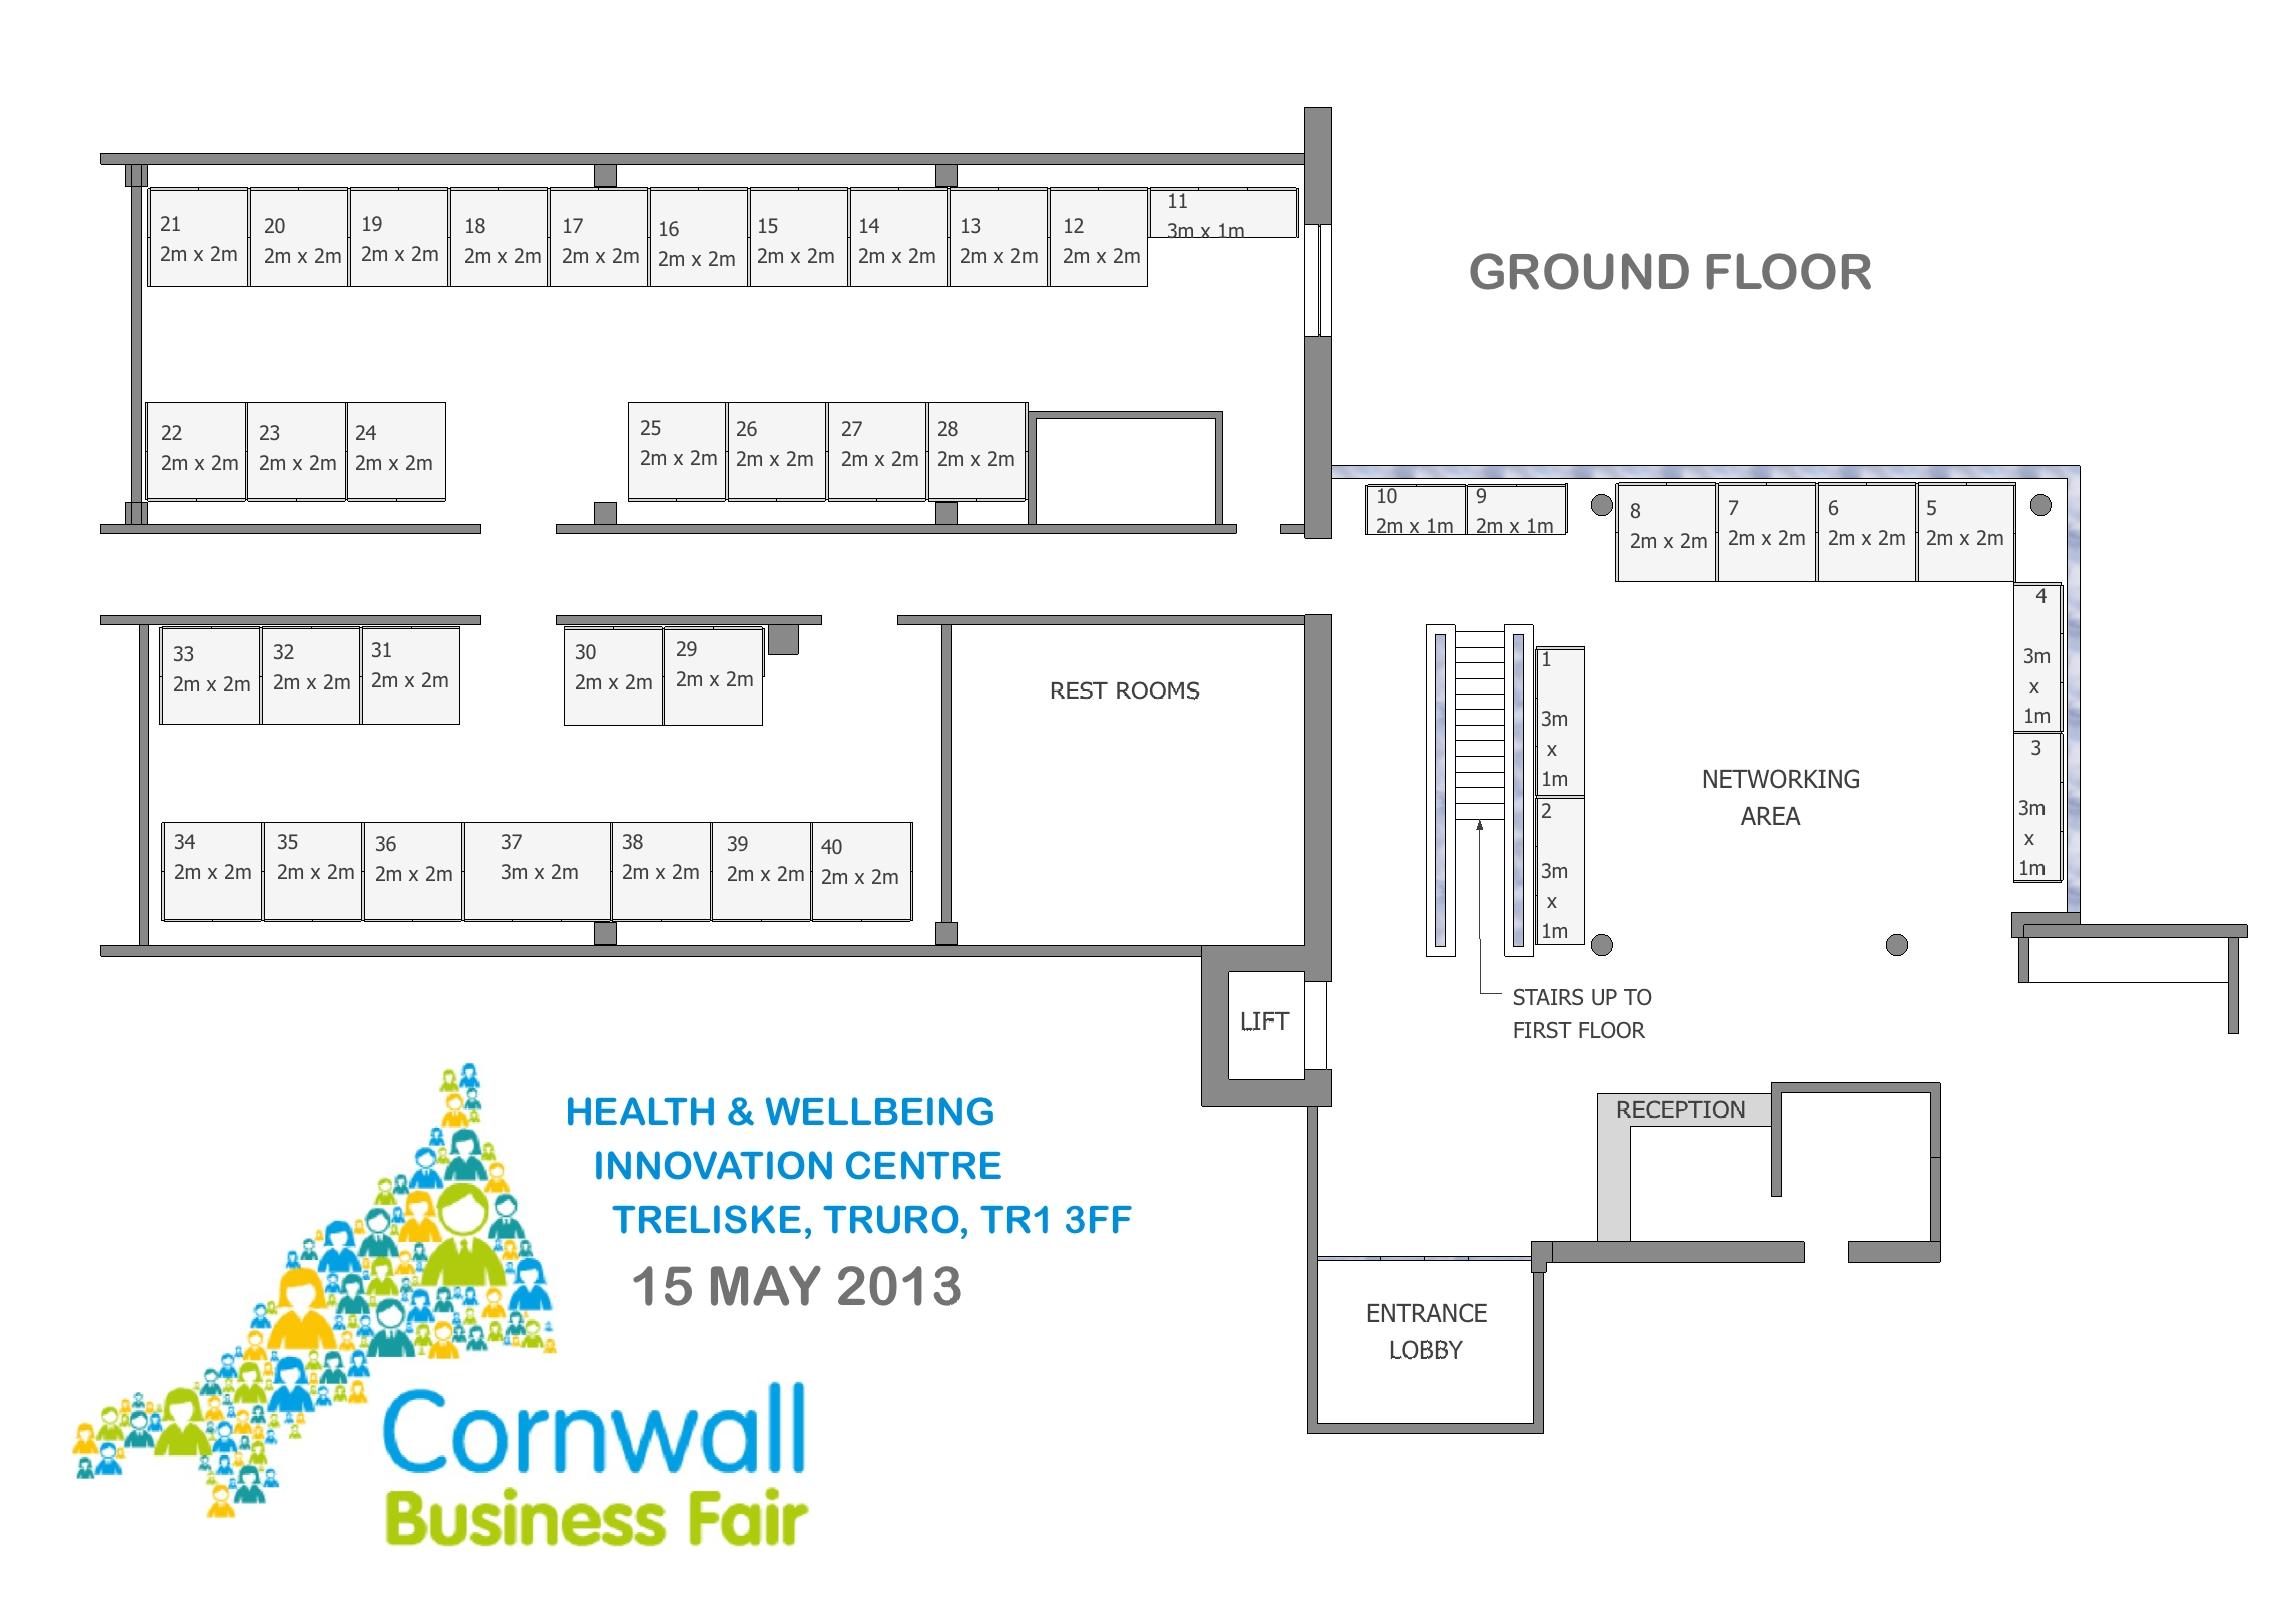 exhibition event planning